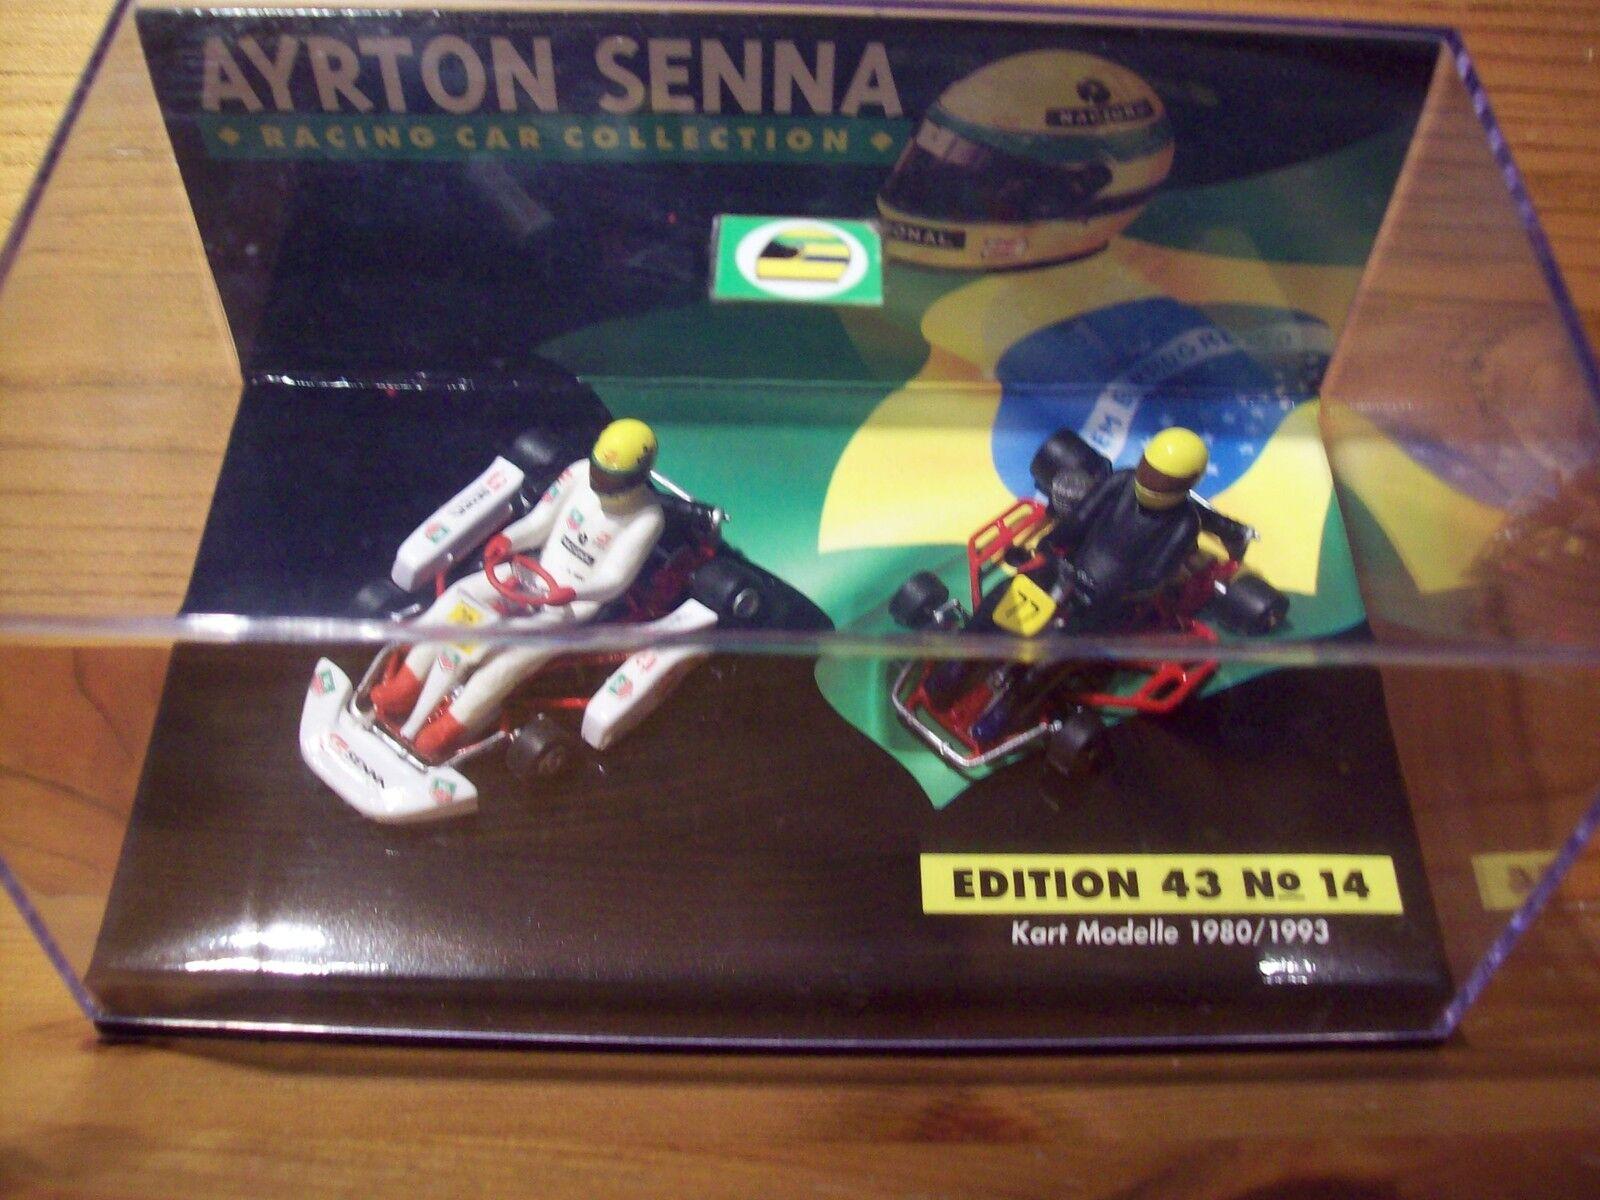 1 43 AYRTON SENNA  Nº 14 Go Kart Twin Set 1980 1993  meilleur choix